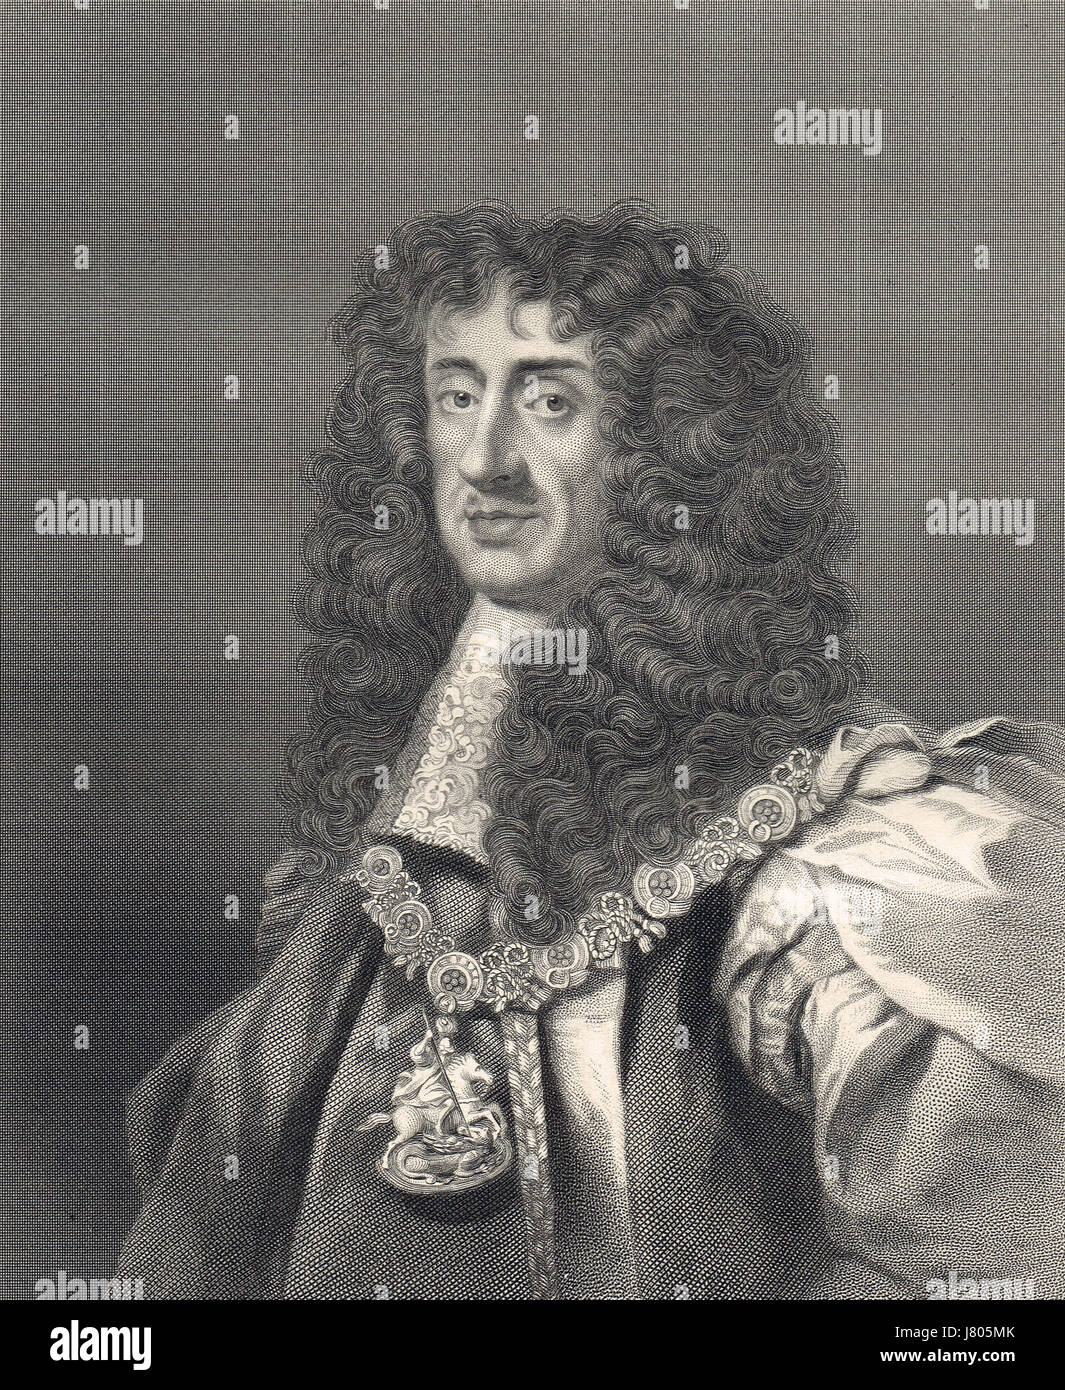 Charles II King of England, king of England, Scotland and Ireland 1660-1685 - Stock Image